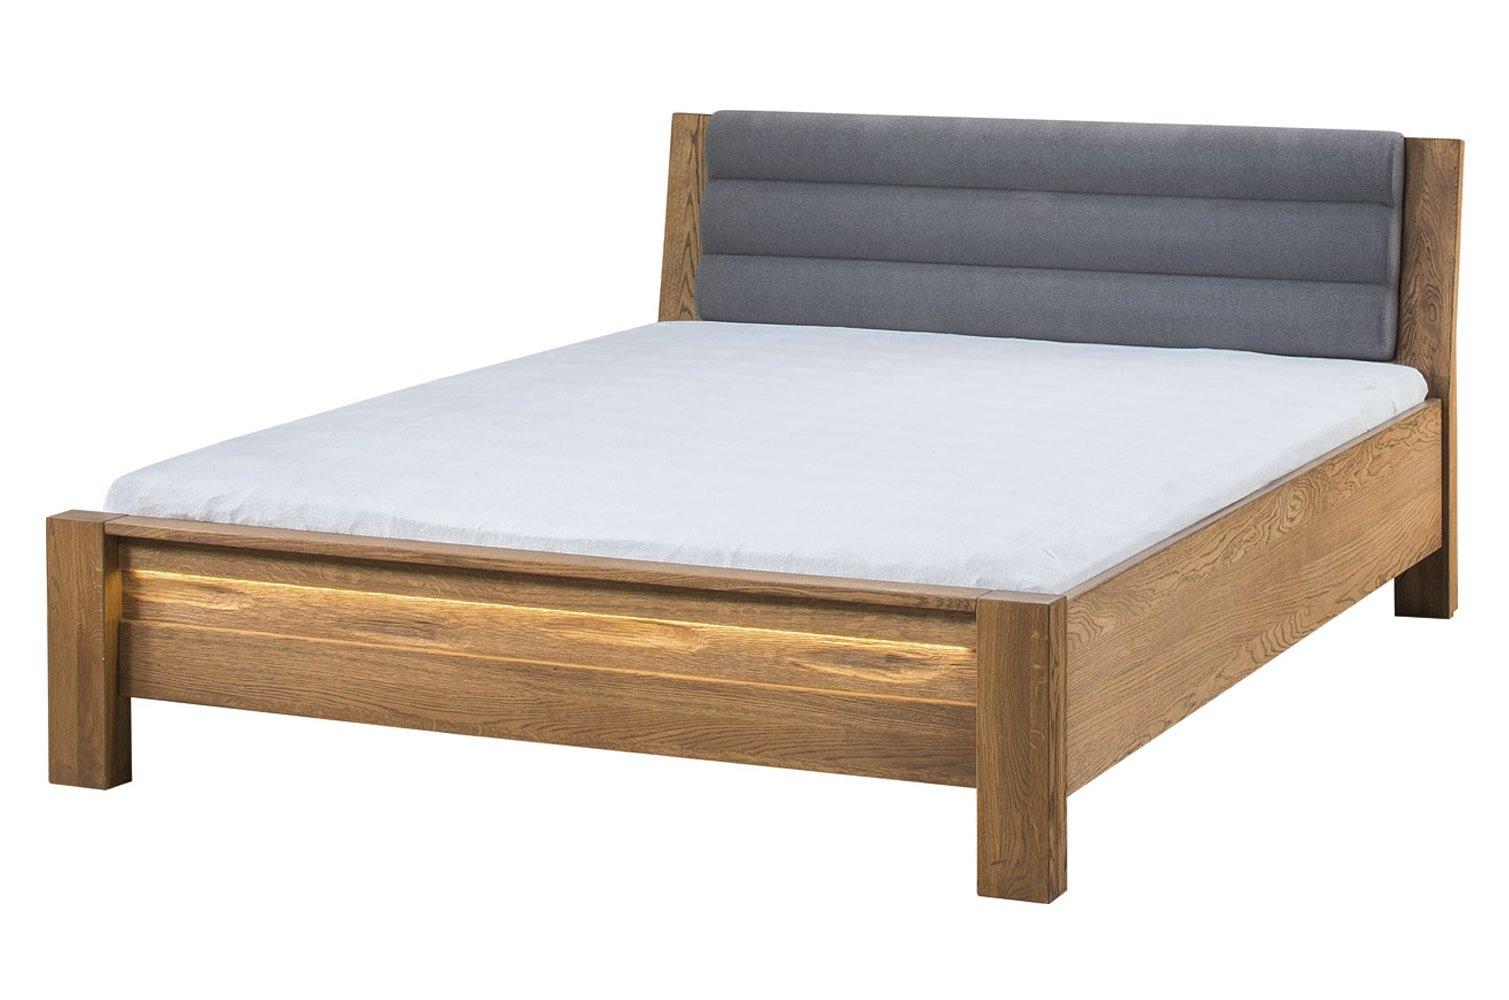 Szynaka Manželská posteľ Velvet 76 Farba: Sivá